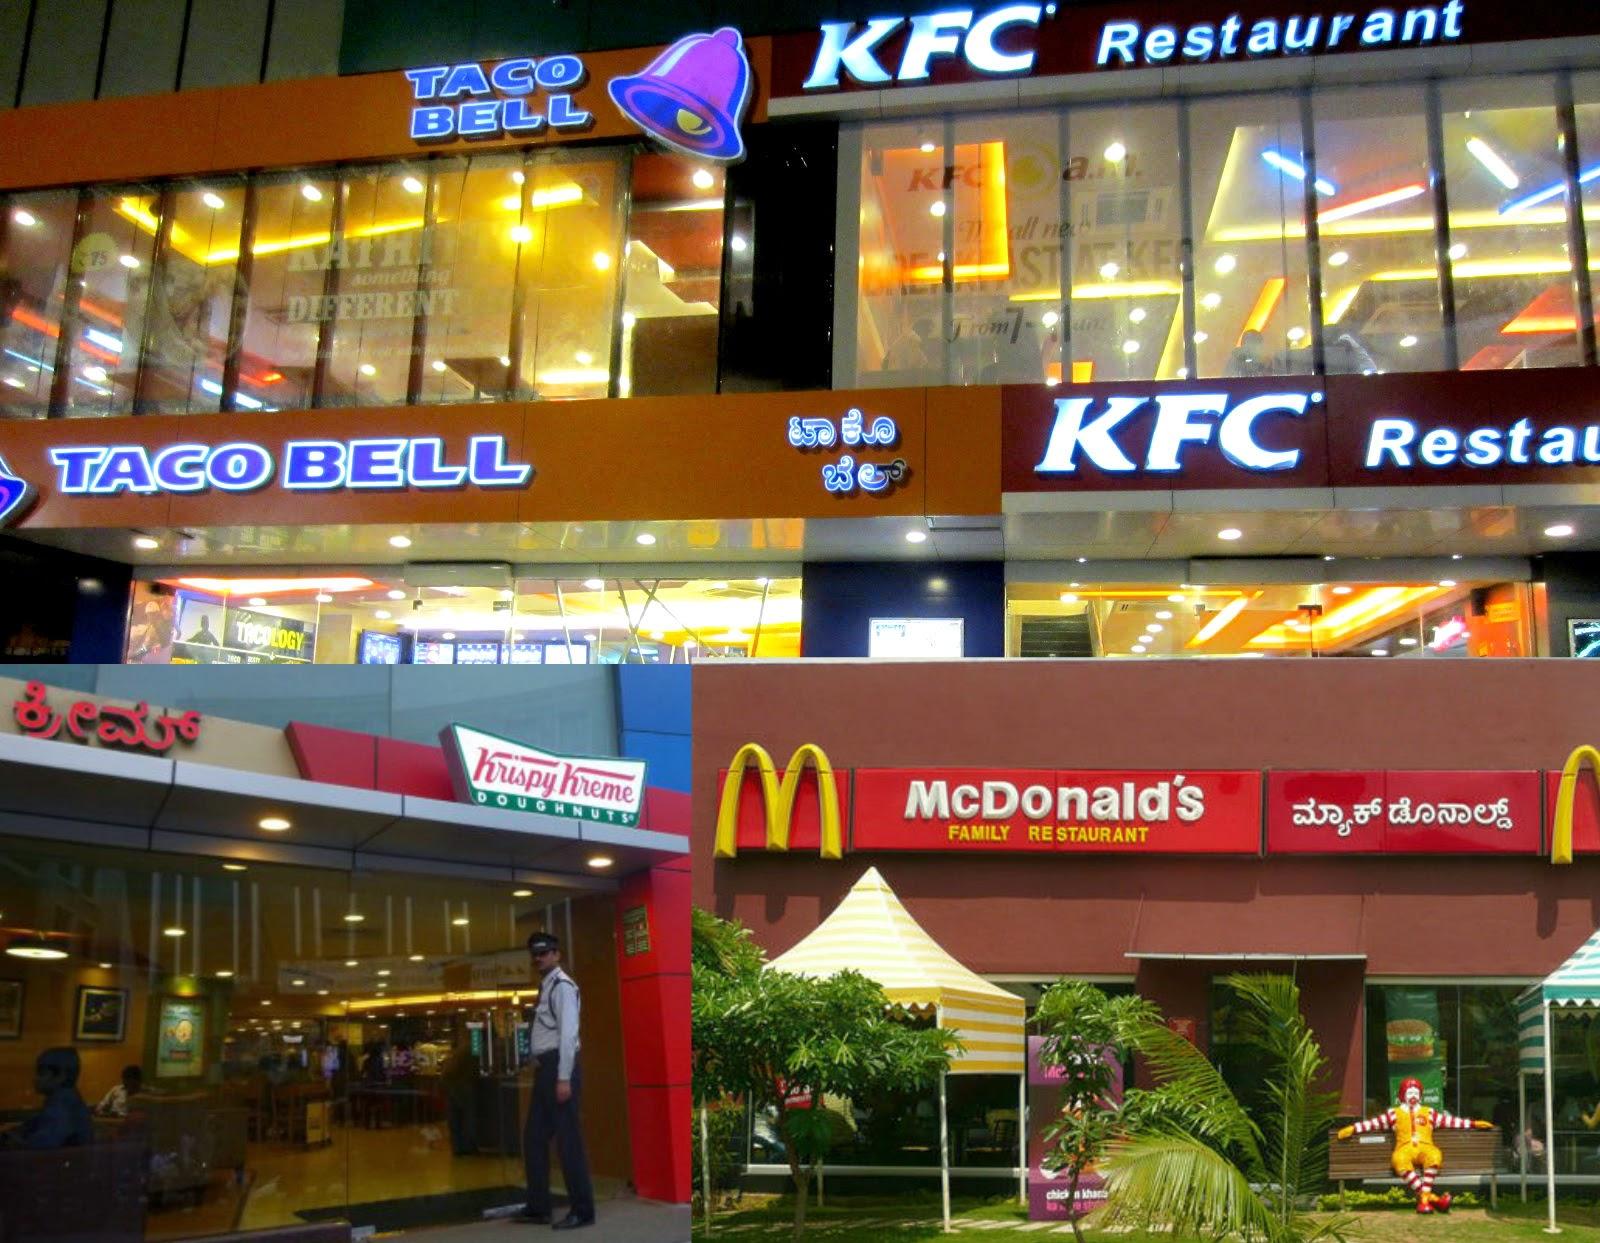 KFC, Mc Donalds, KrispyKreme, TacoBell